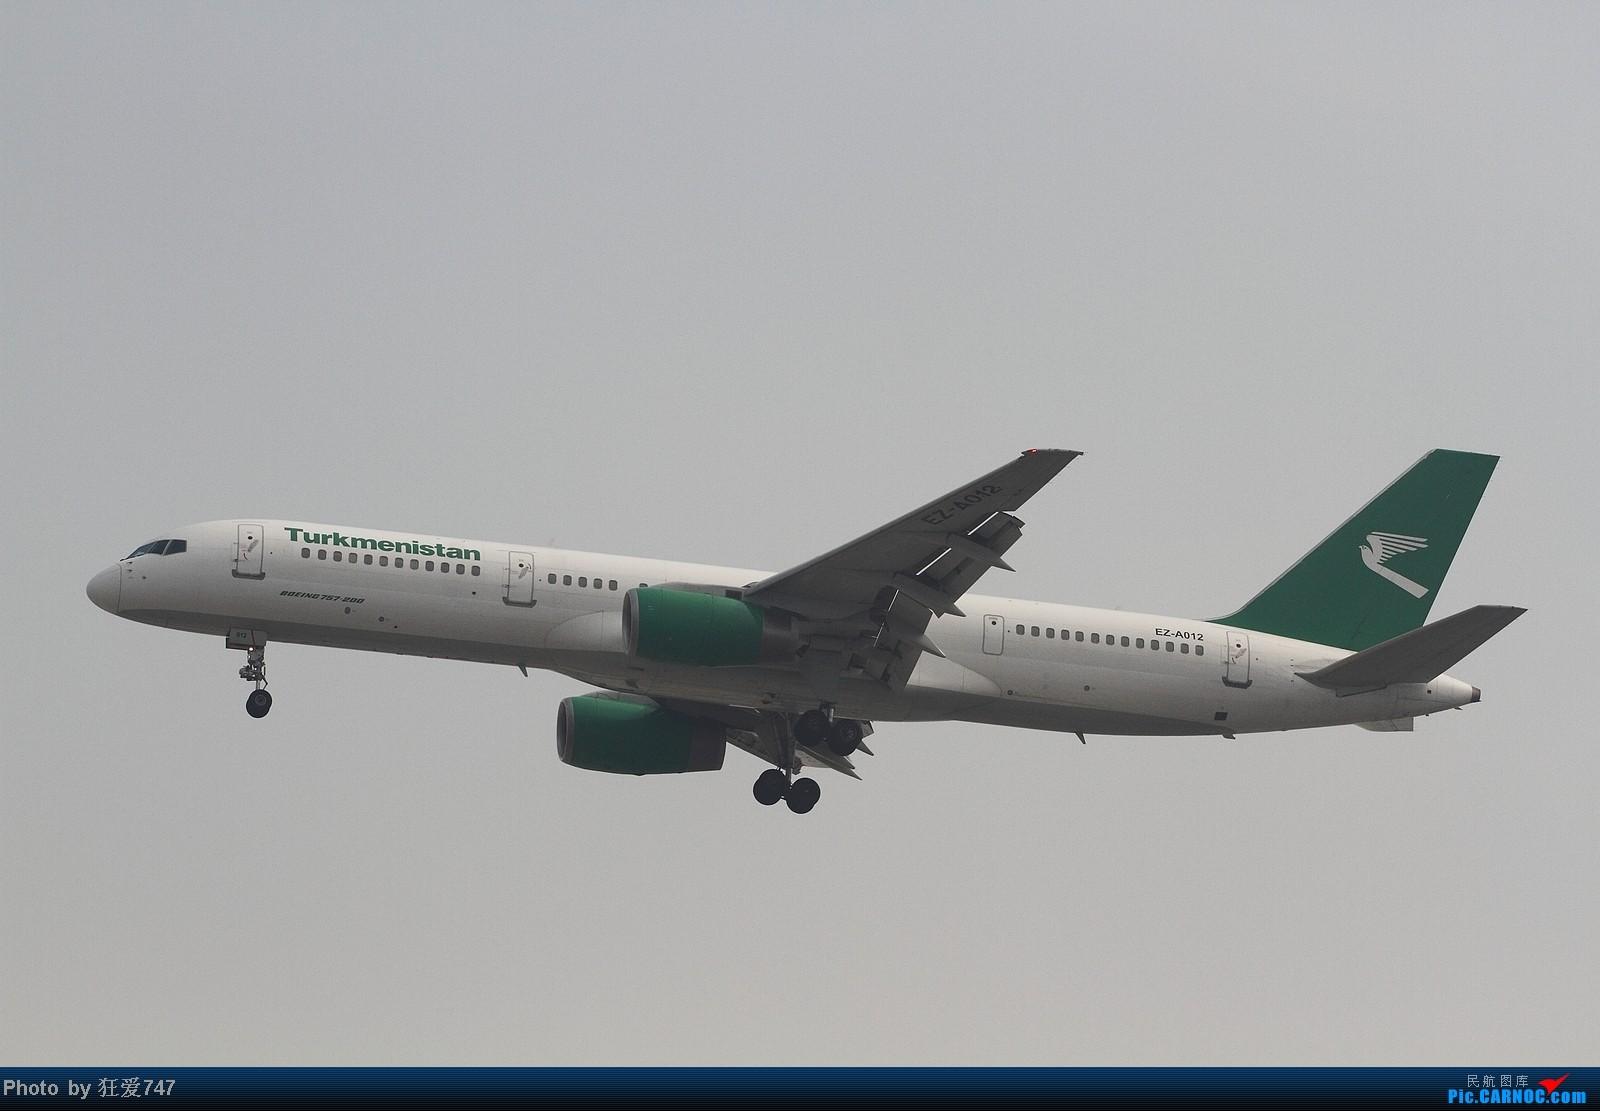 Re:[原创]今天北京是个大烂天儿,于是烂天来好货的定律再现! BOEING 757-22K EZ-A012 中国北京首都机场